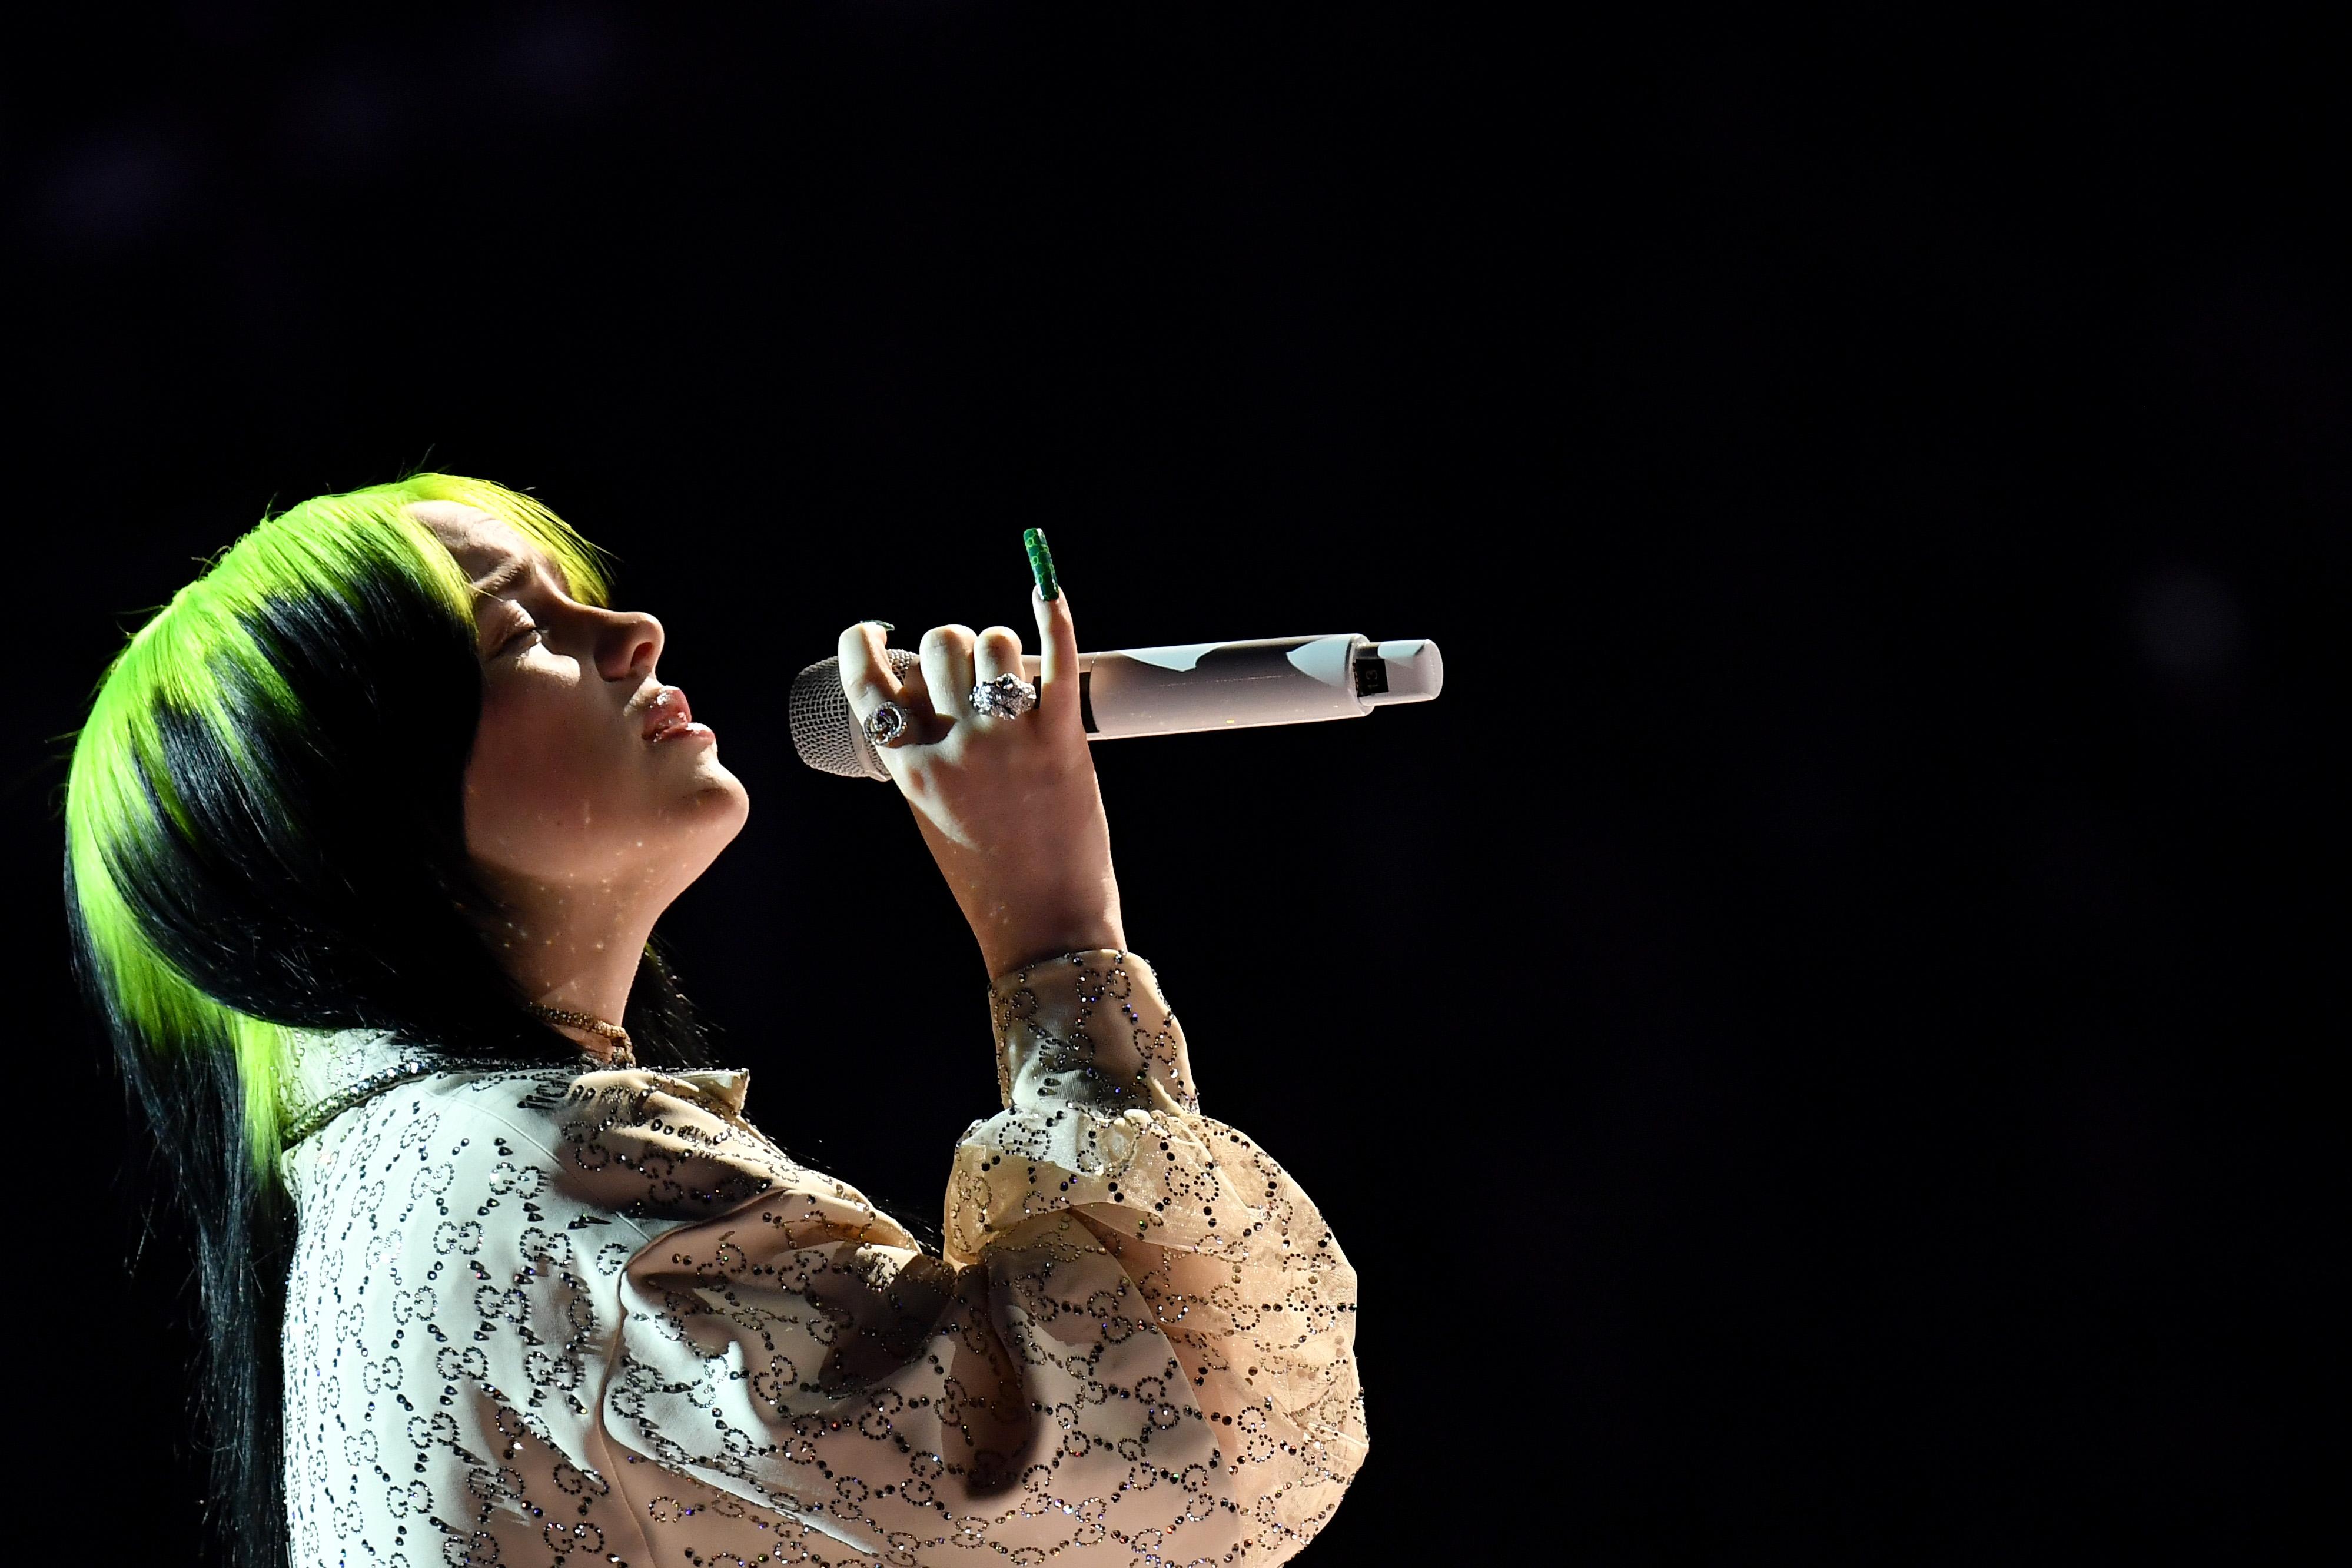 Billie Eilish62nd Annual Grammy Awards, Show, Los Angeles, USA - 26 Jan 2020